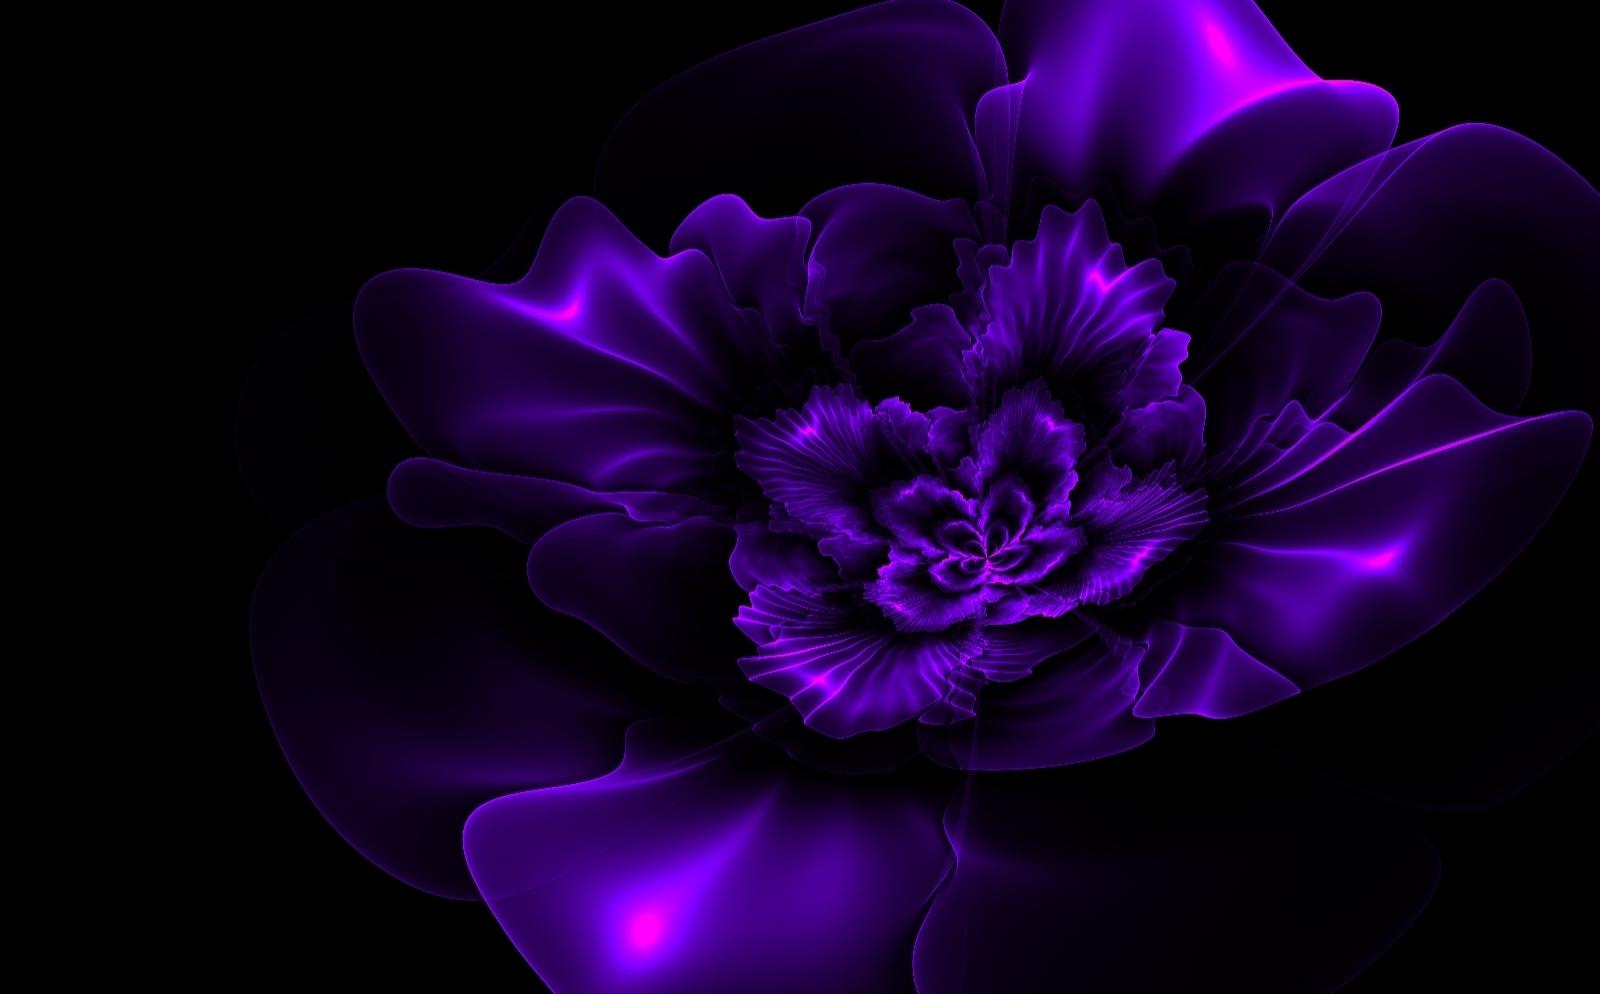 black and purple floral wallpaper dark purple flowers pictures 06